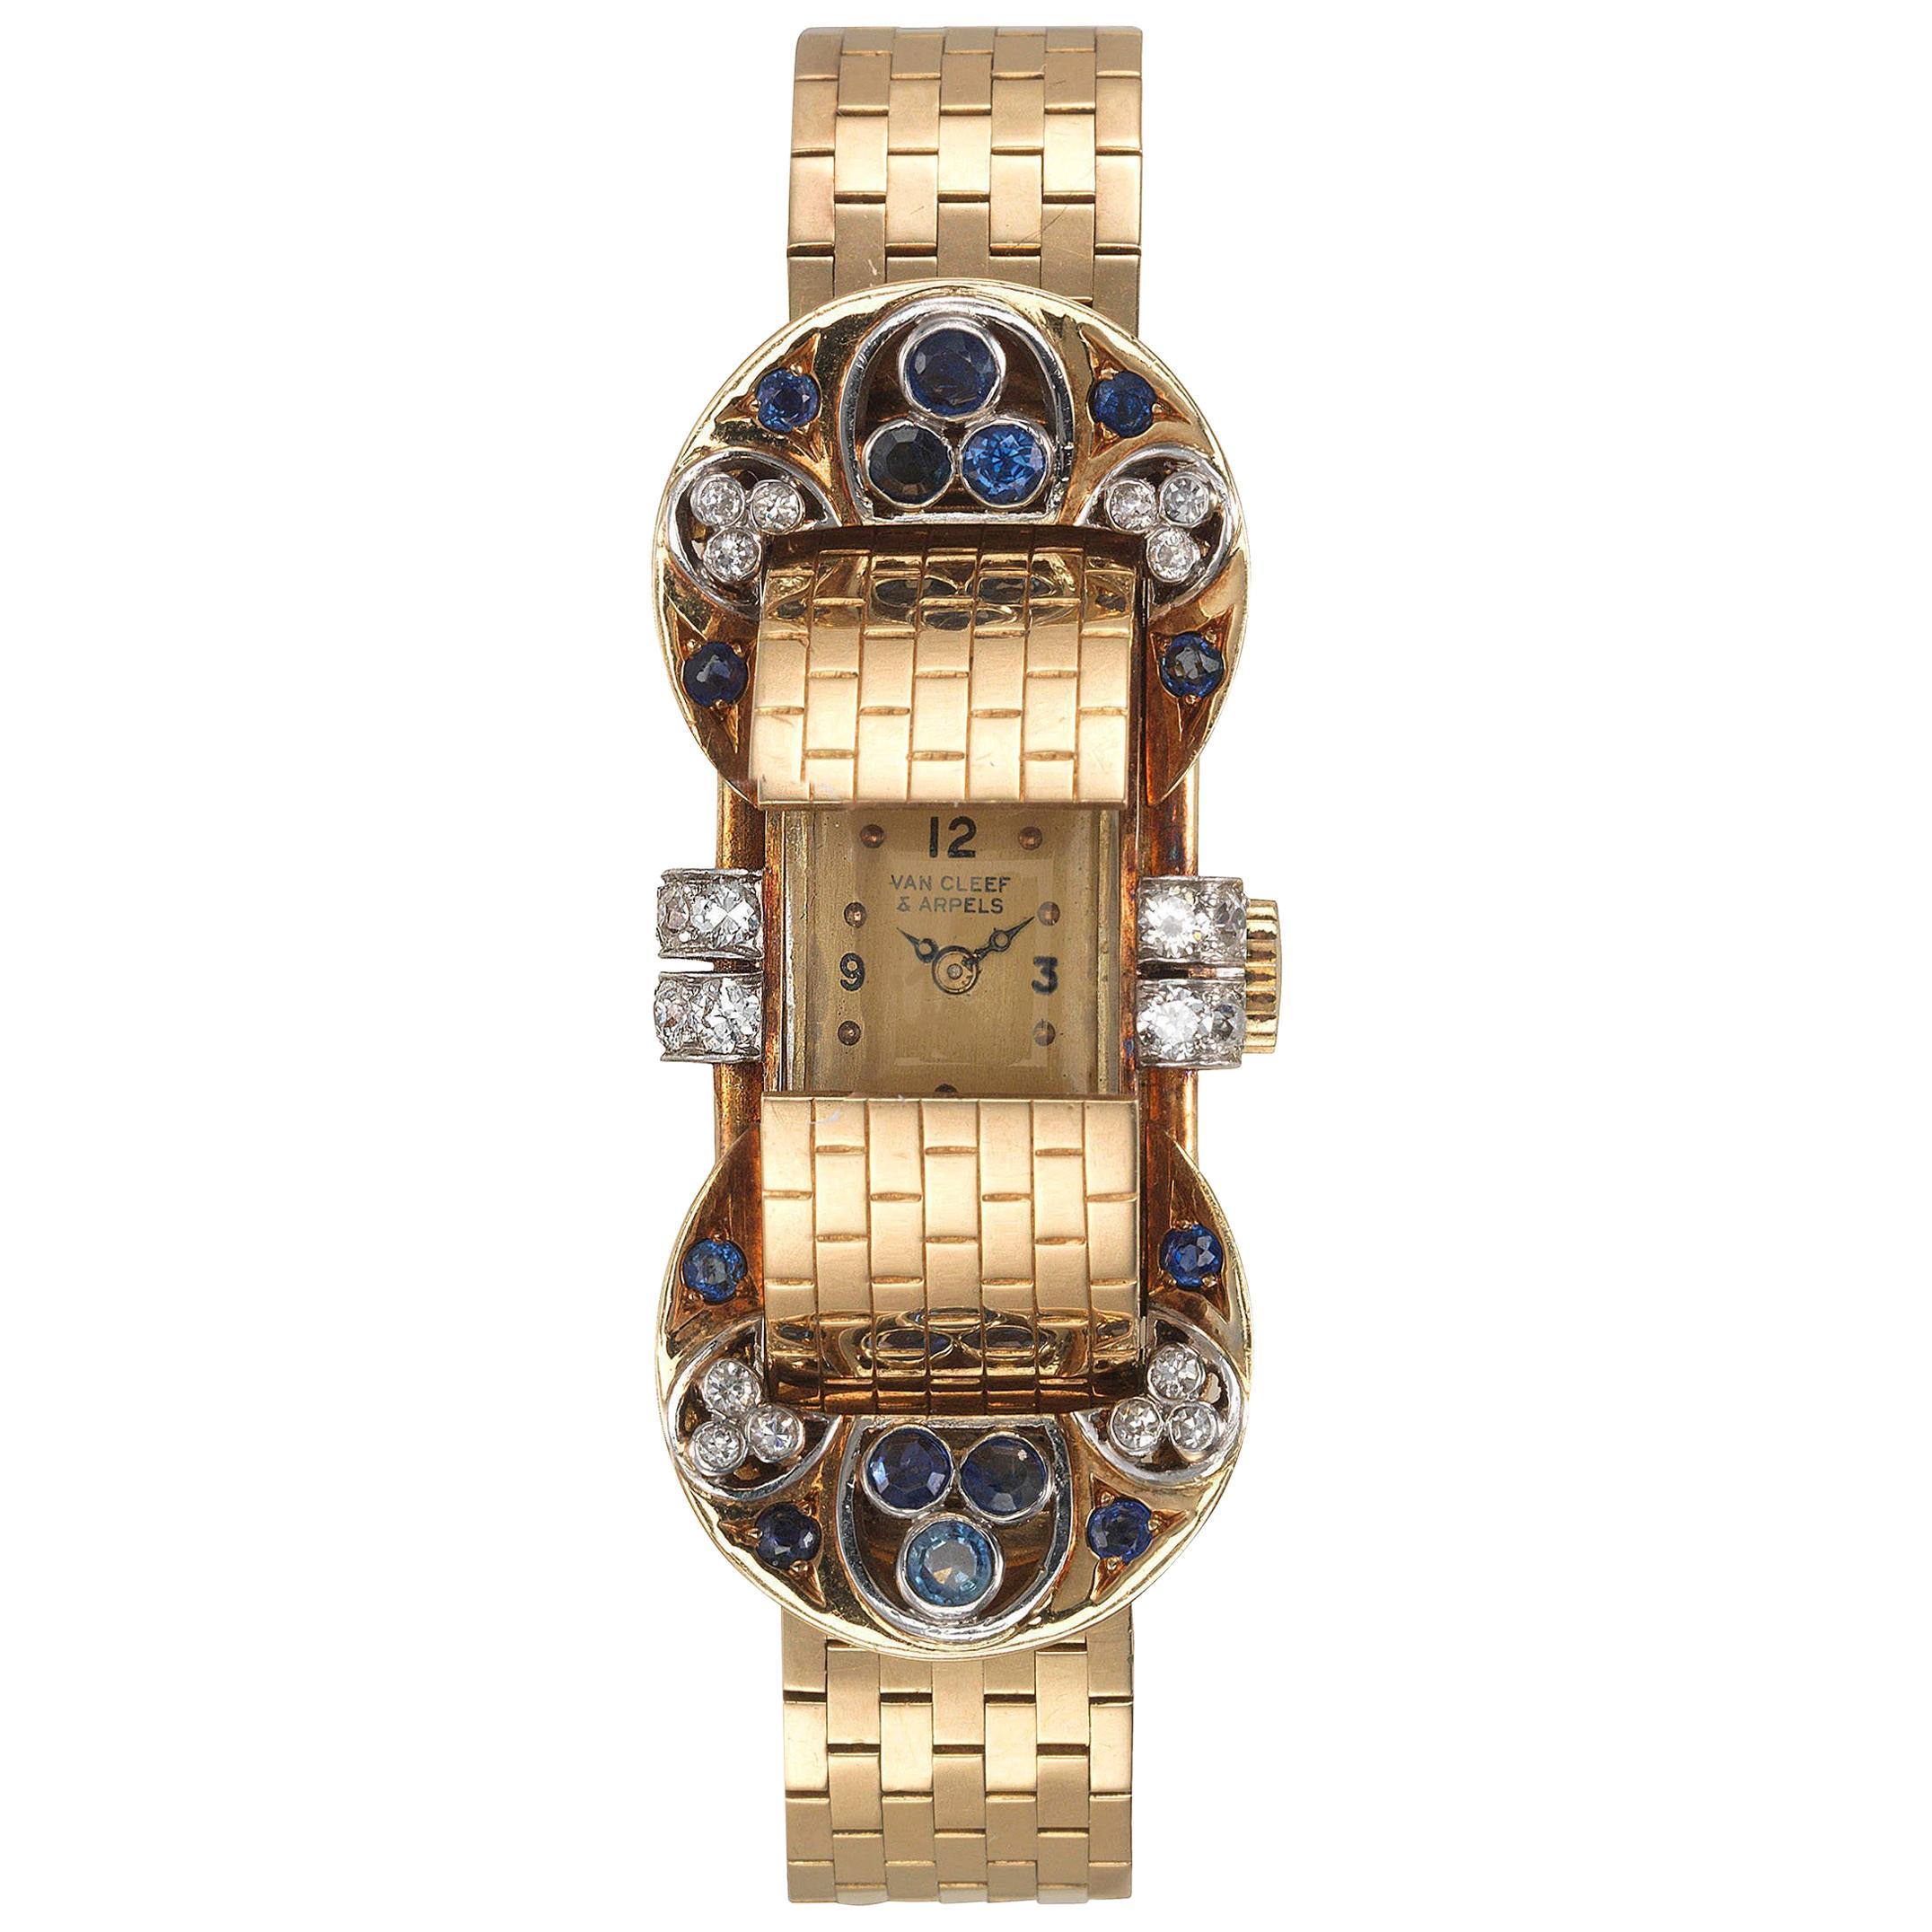 Van Cleef & Arpels Sapphire Diamond Yellow Gold Retro Mystery Watch-Bracelet